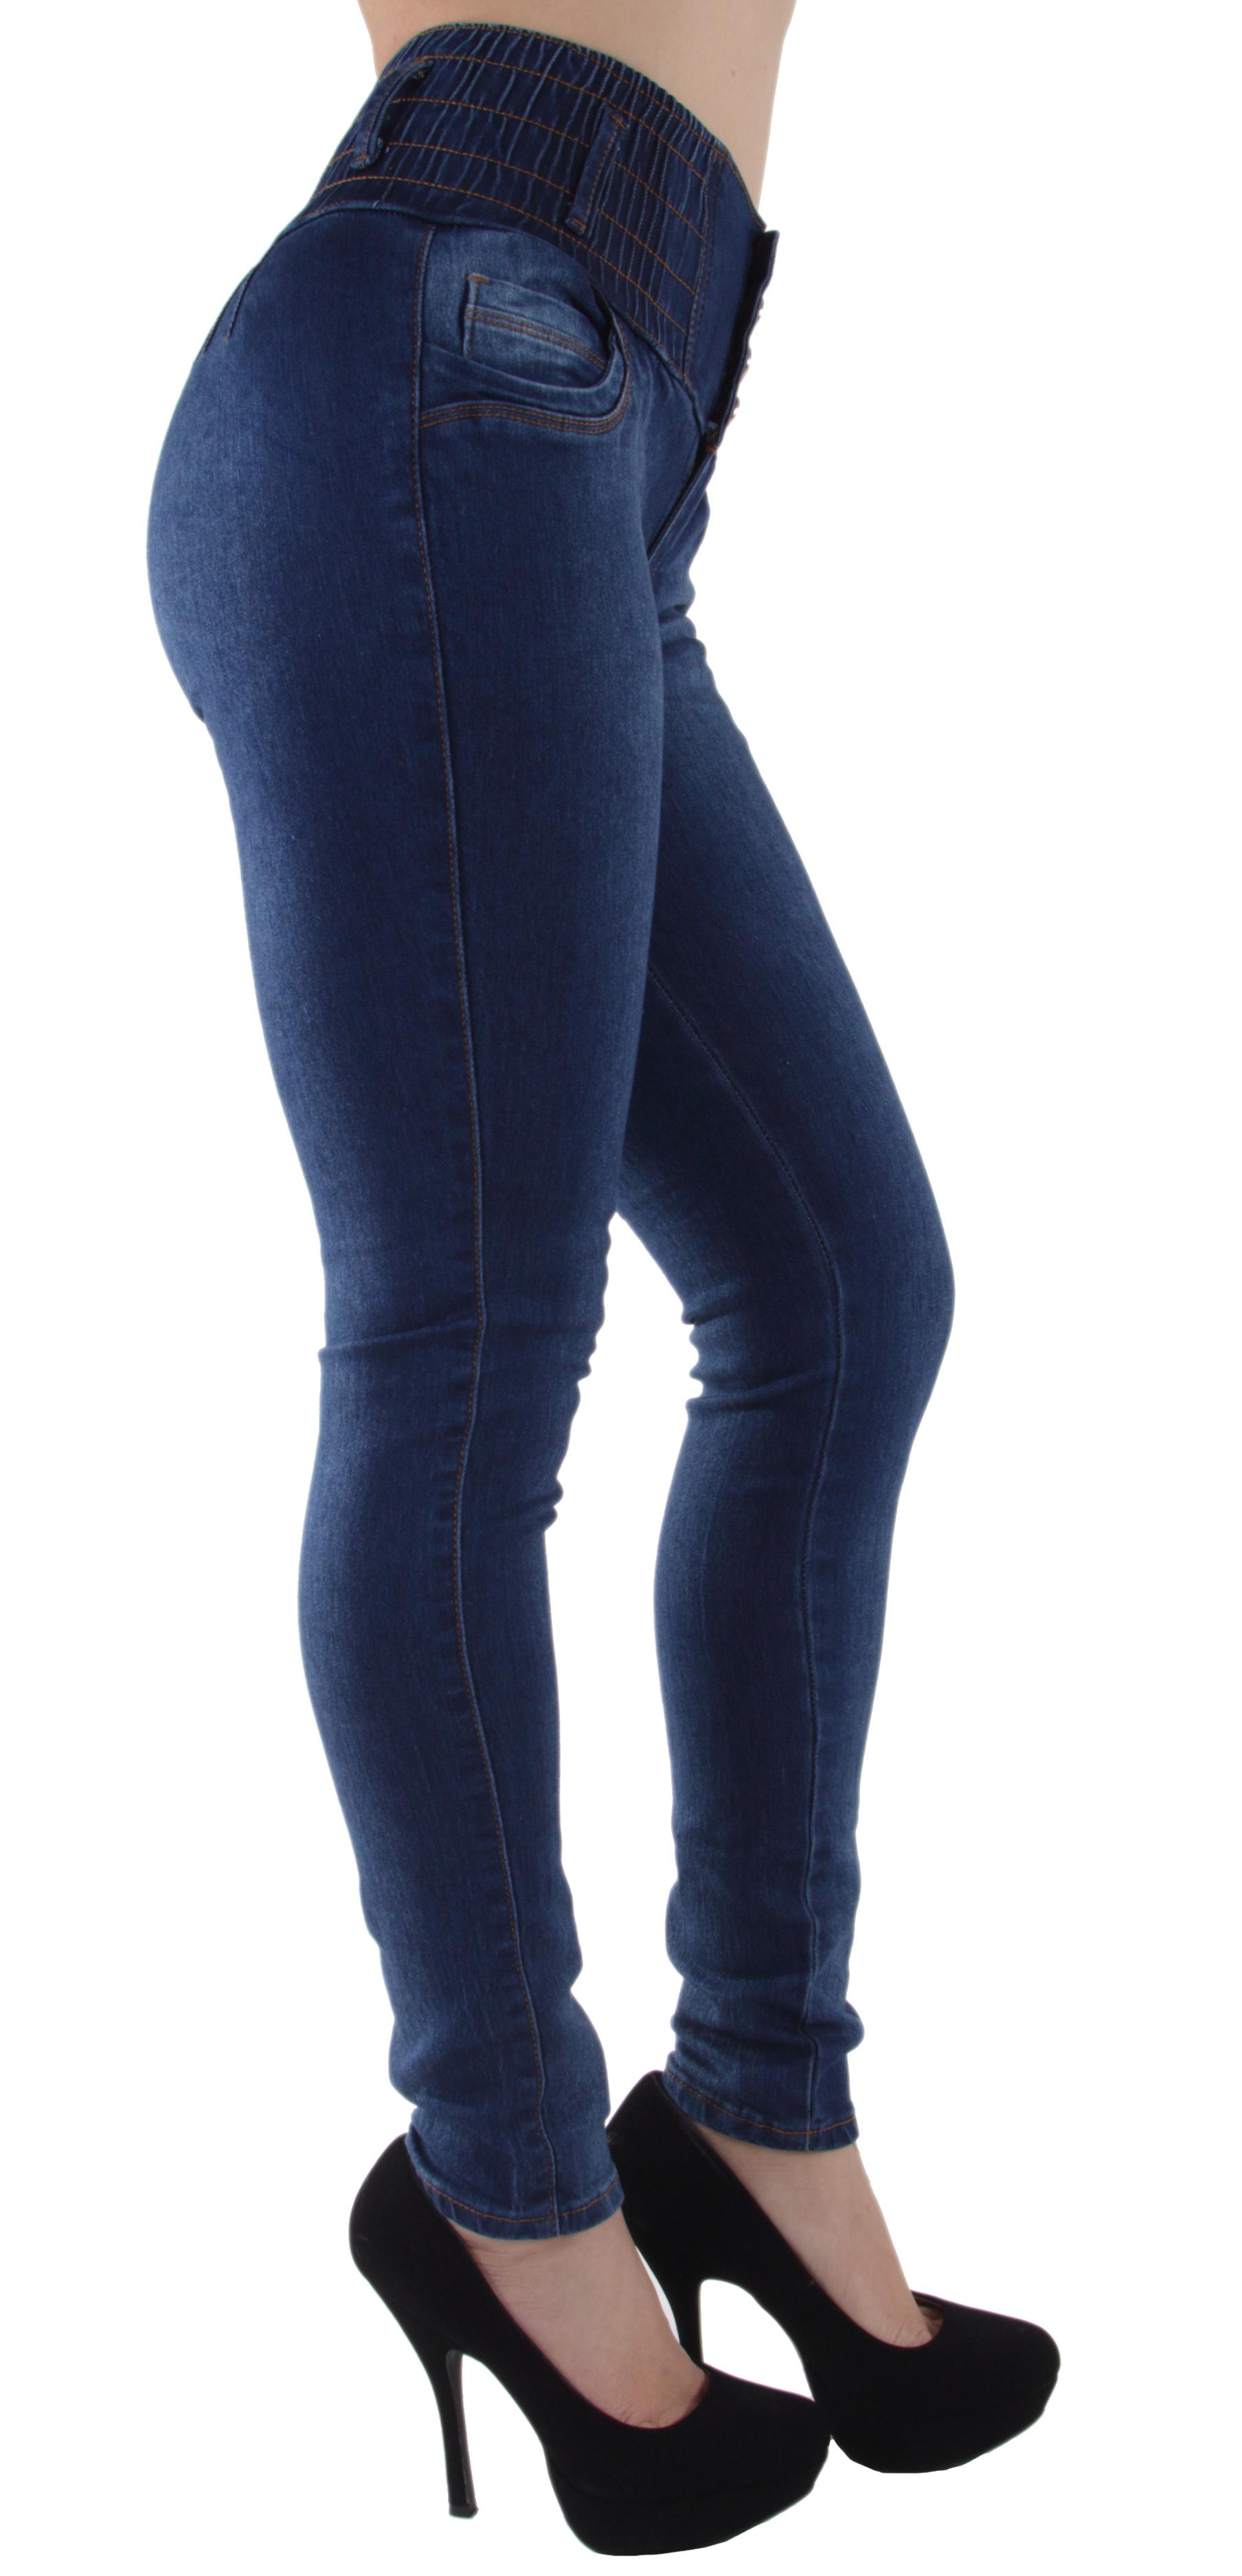 N2127-Butt-Lift-Levanta-Cola-High-Elastic-Waist-Skinny-Jeans